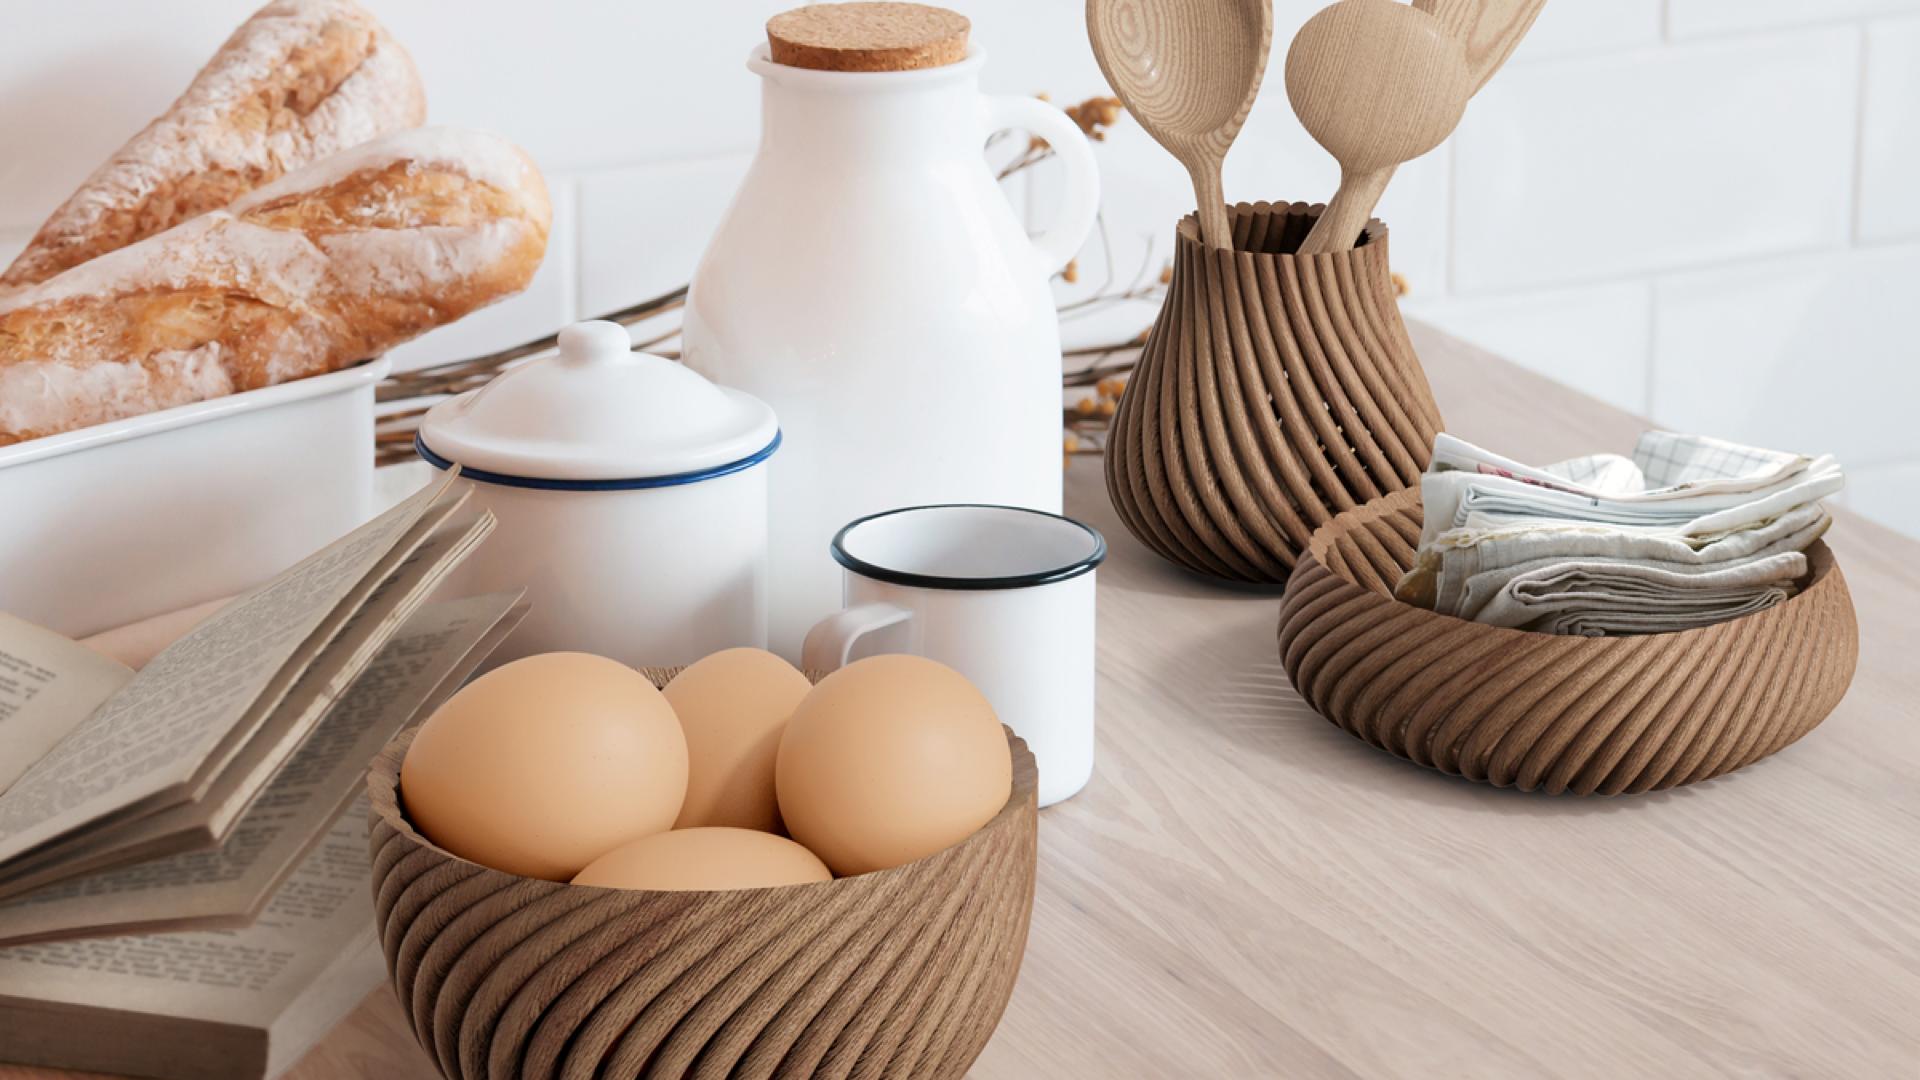 Forust 3D printed wood